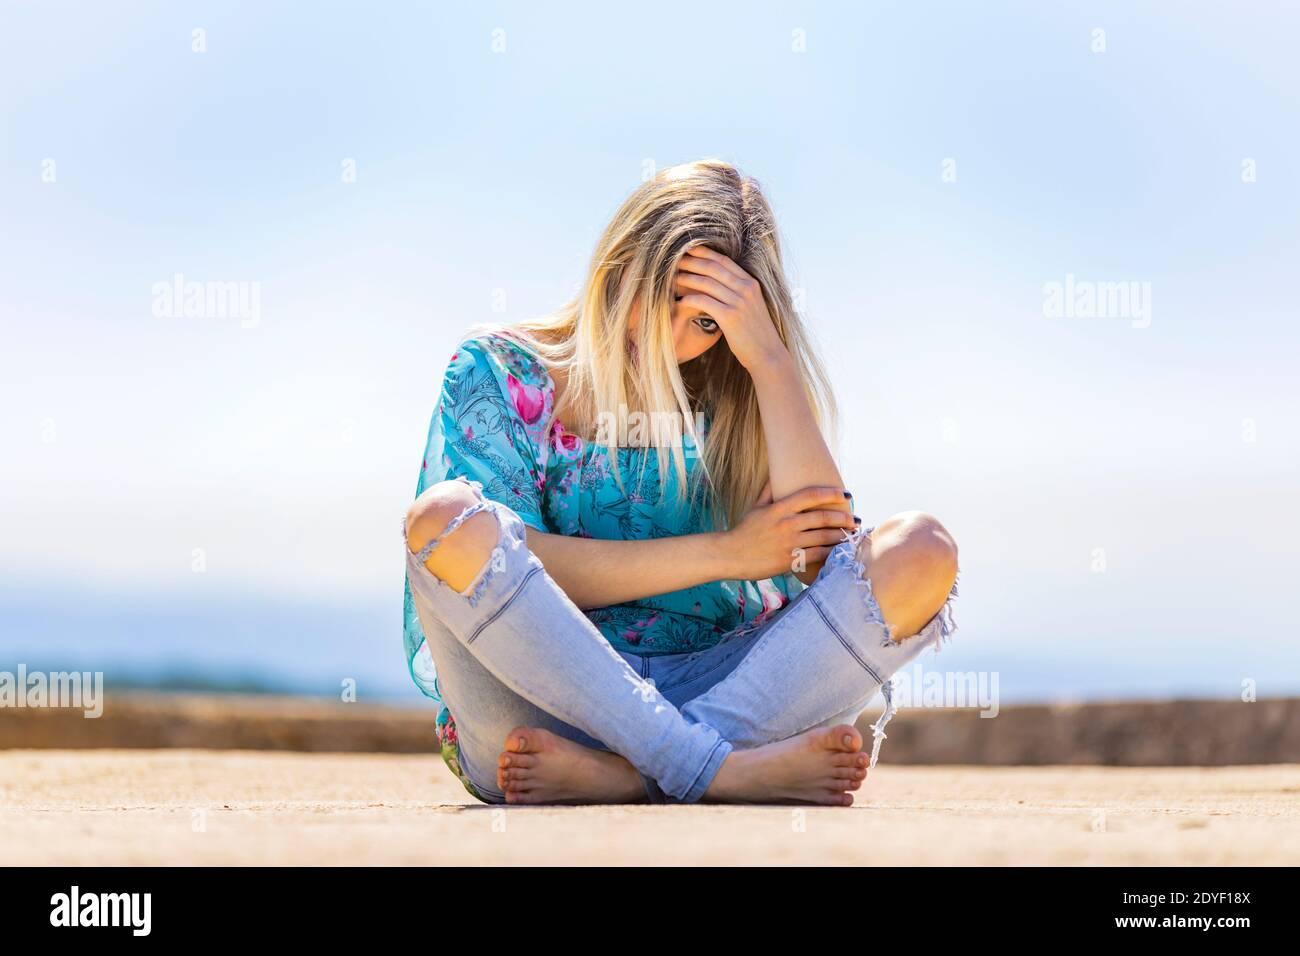 Blonde teengirl sitting on ground street crossed legs cross legged barefeet bare-feet wearing ripped denim denims pants low view peeking one eye shy Stock Photo